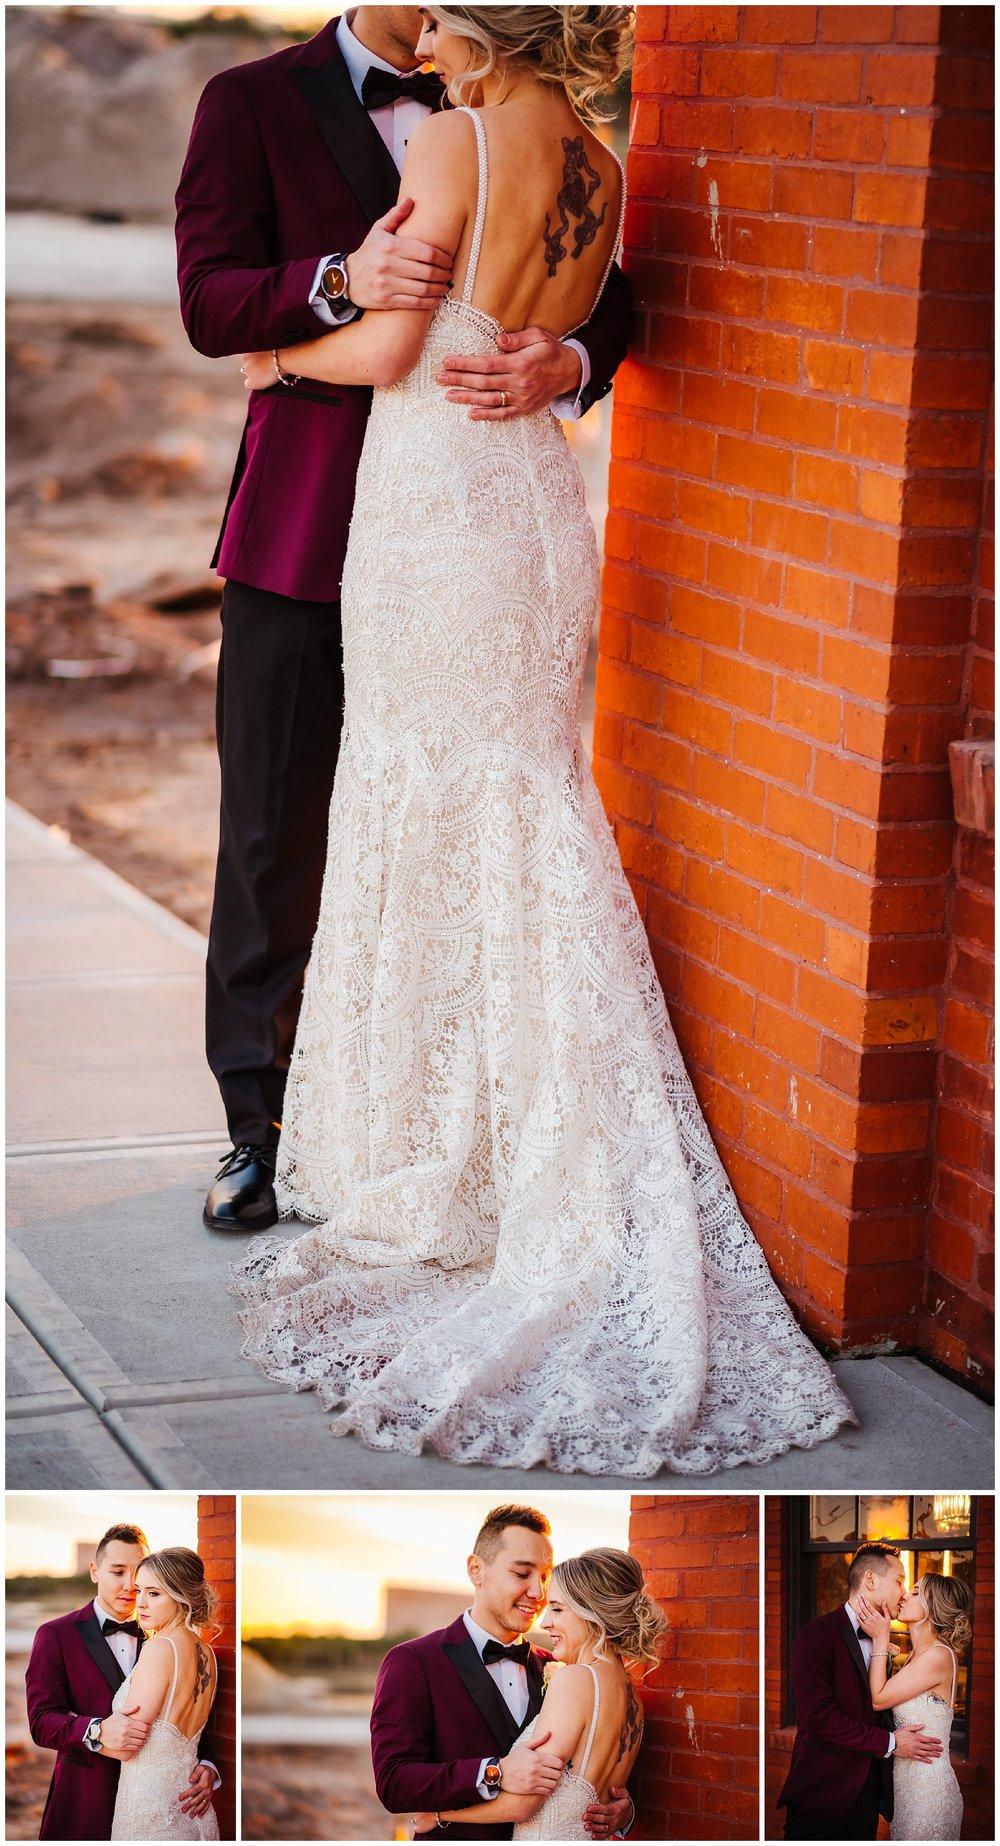 tampa-armeture-wedding-photographer-edgy-industrial-downtown-fancy-free-nursery-tattoo-burgandy-velvet_0058.jpg